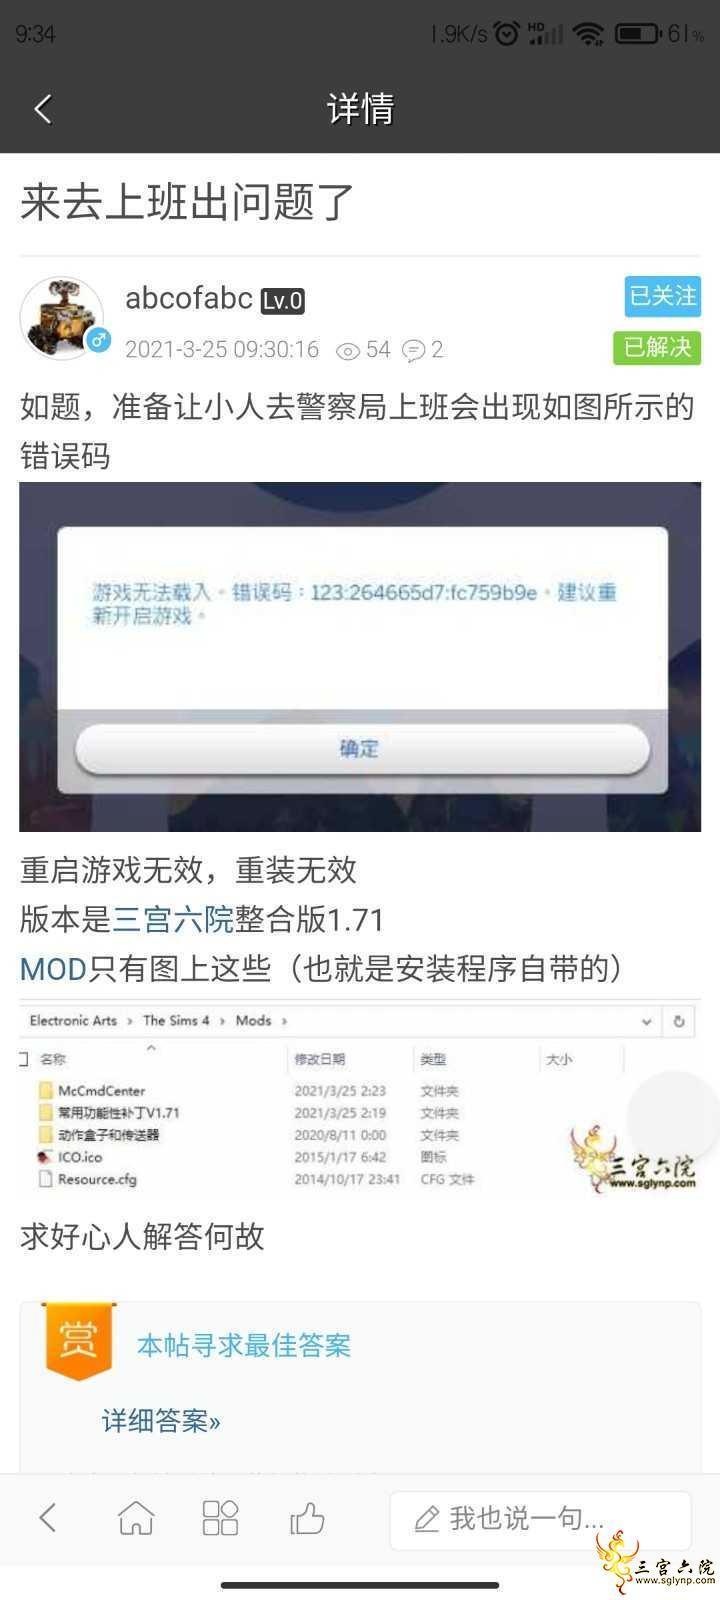 Screenshot_2021-07-22-09-34-45-547_com.o962063168.wuc.jpg